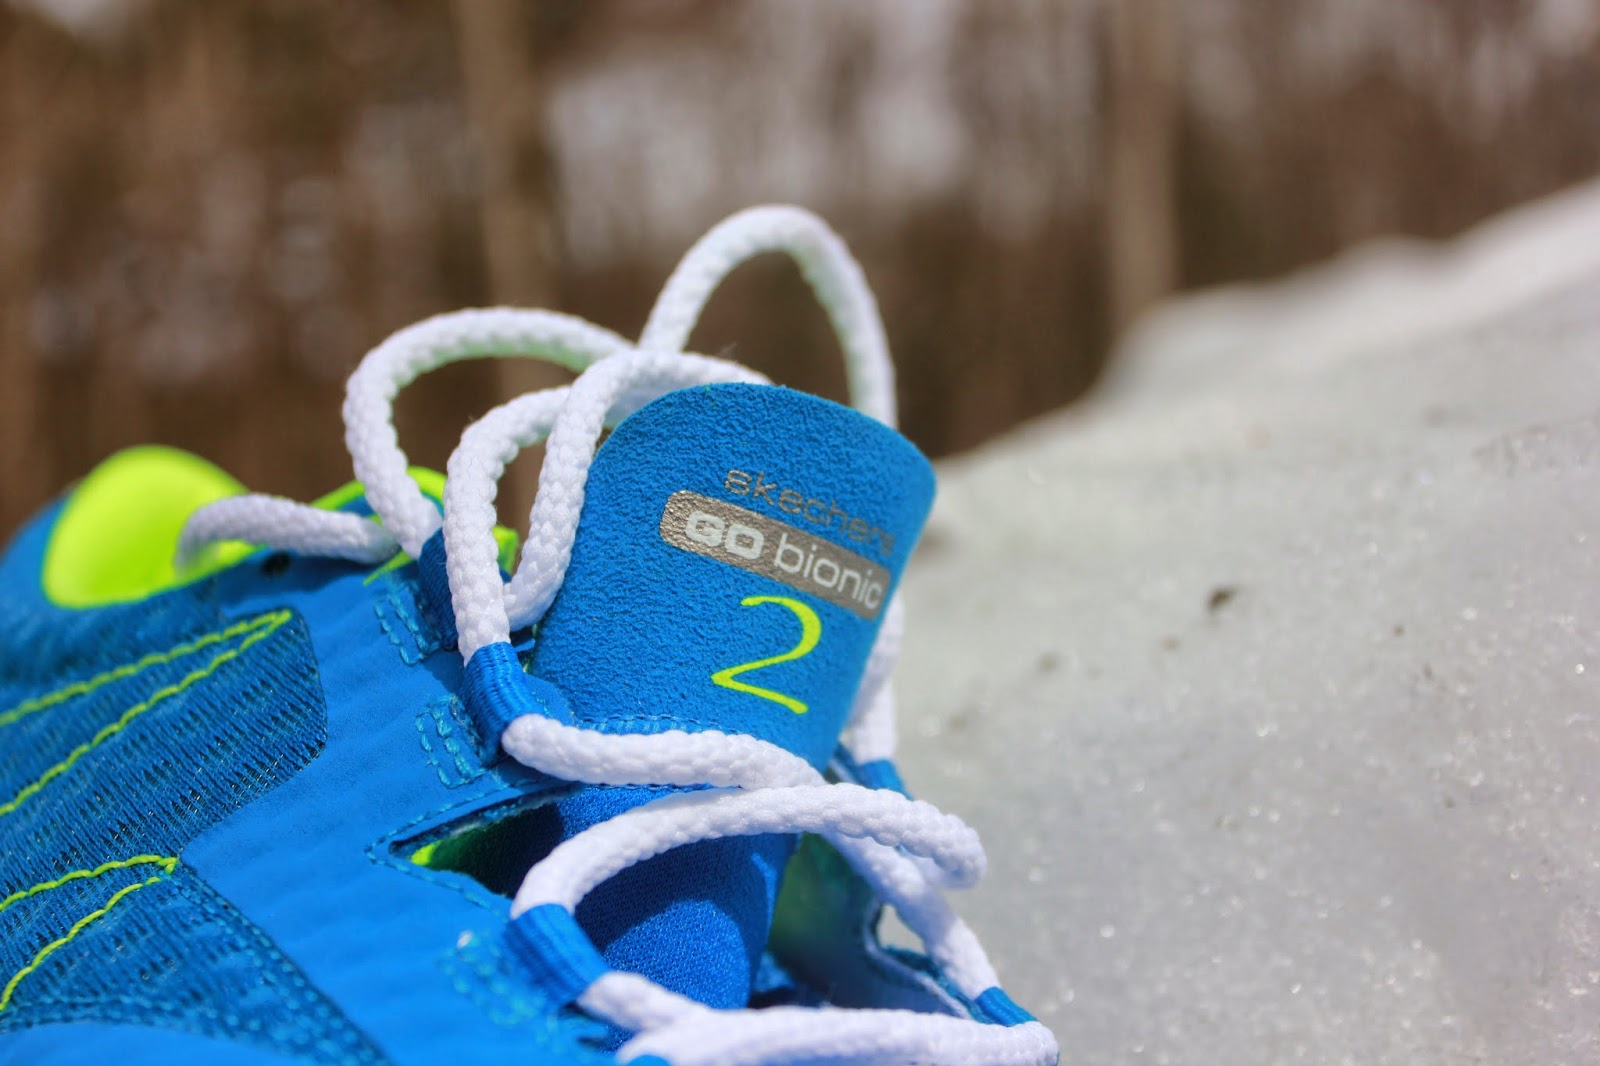 RunningSwede : Skechers GoBionic2 Review